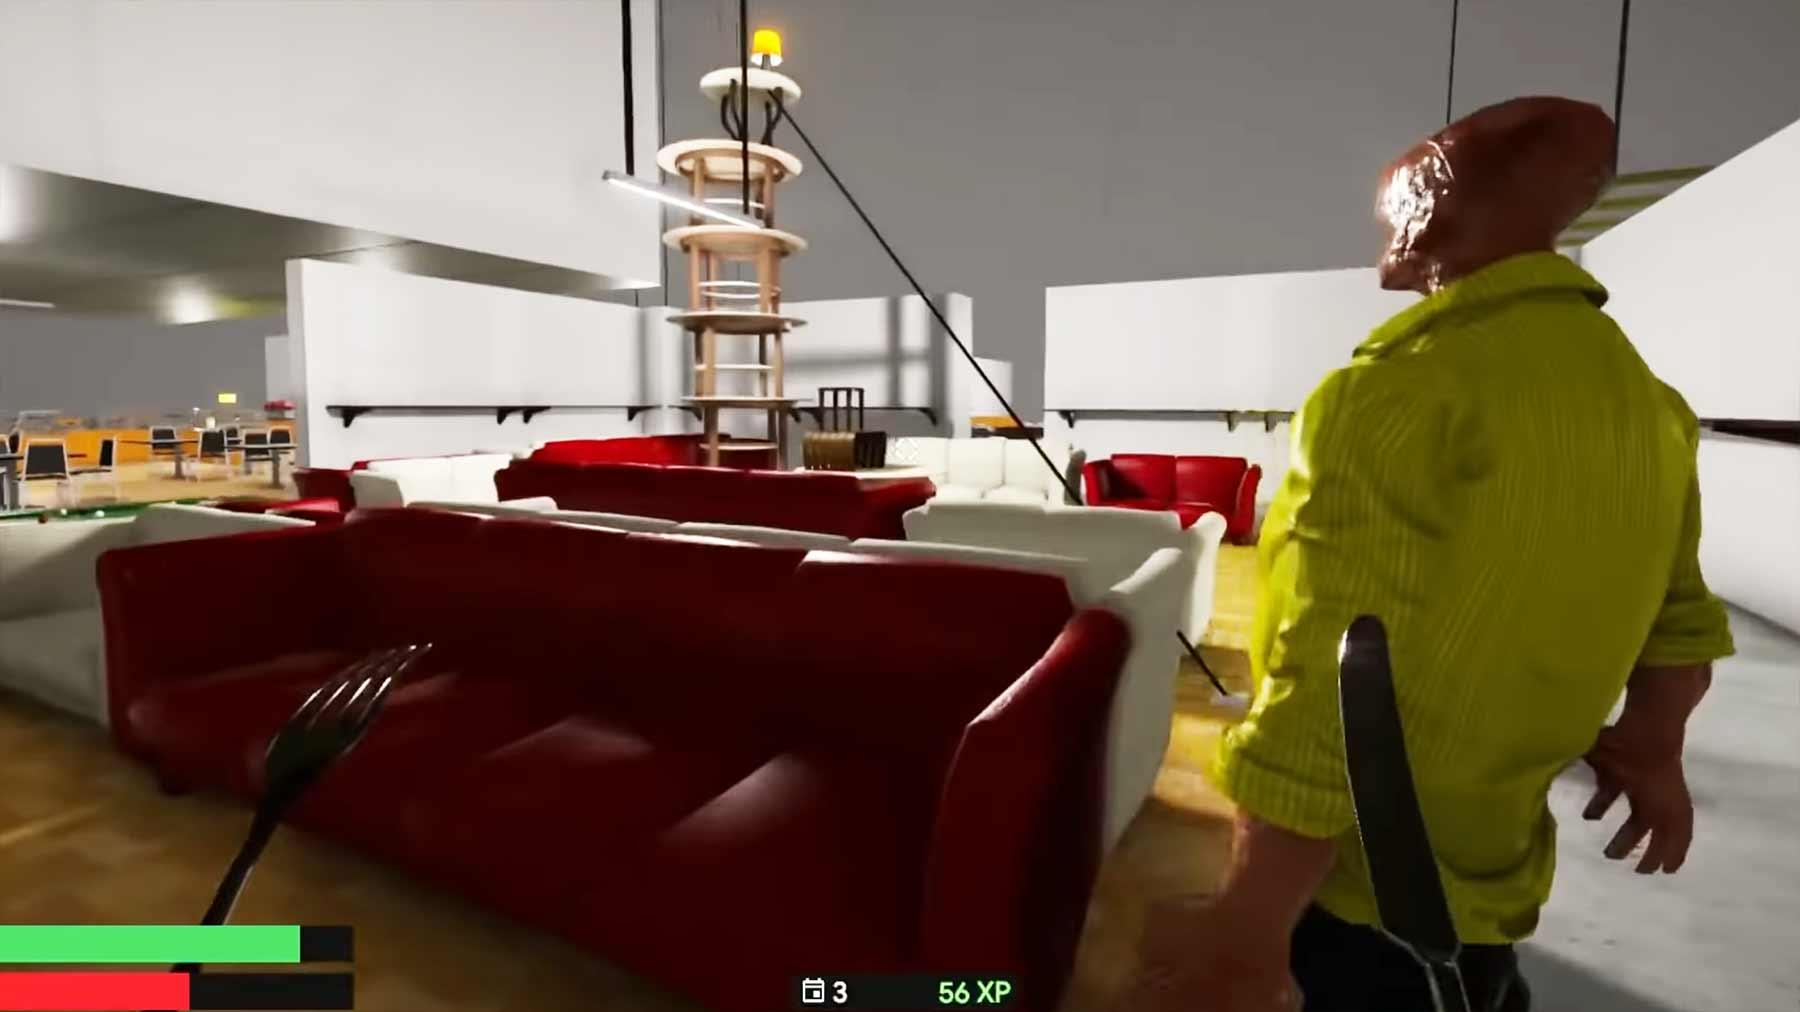 "IKEA-Survival-Simulator ""SCP-3008"" SCP-3008-IKEA-Survival-simulator"